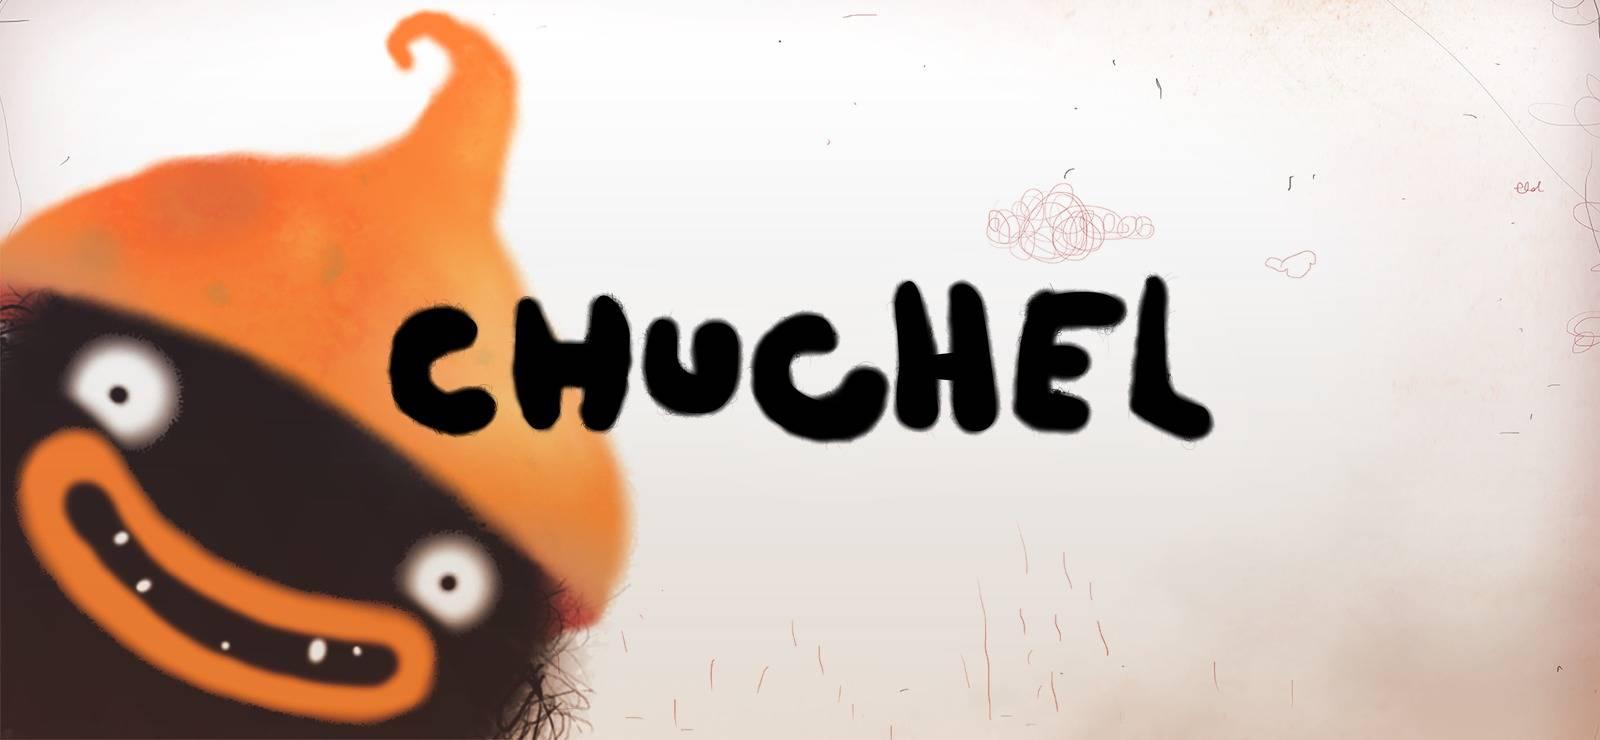 CHUCHEL (2018)